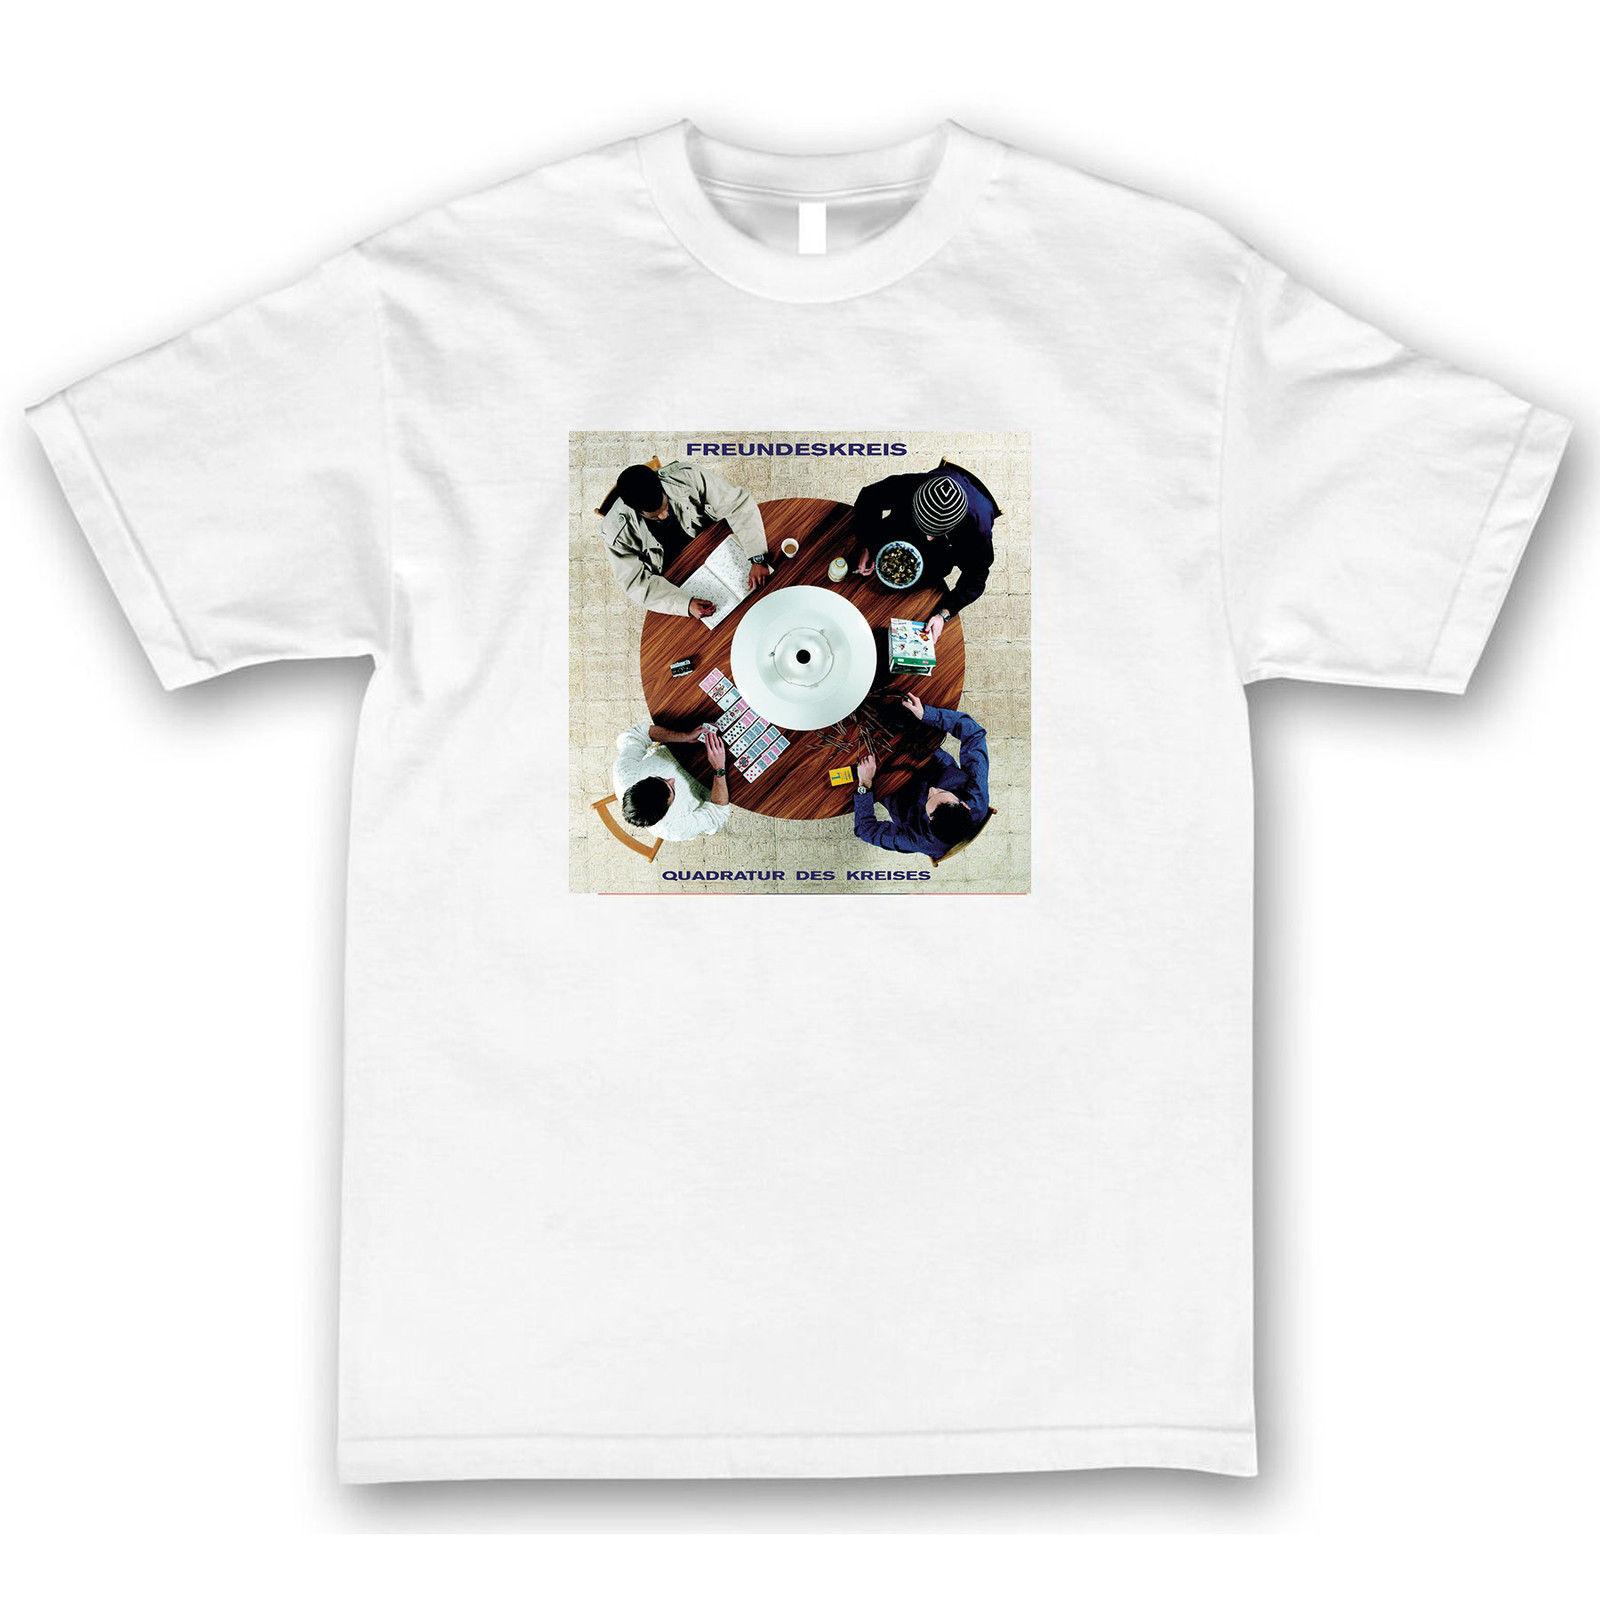 Freundeskreis Quadratur Des Kreises T Shirt Tee Shirt Hipster Harajuku Brand Clothing T-Shirt Sleeve T Shirt Homme